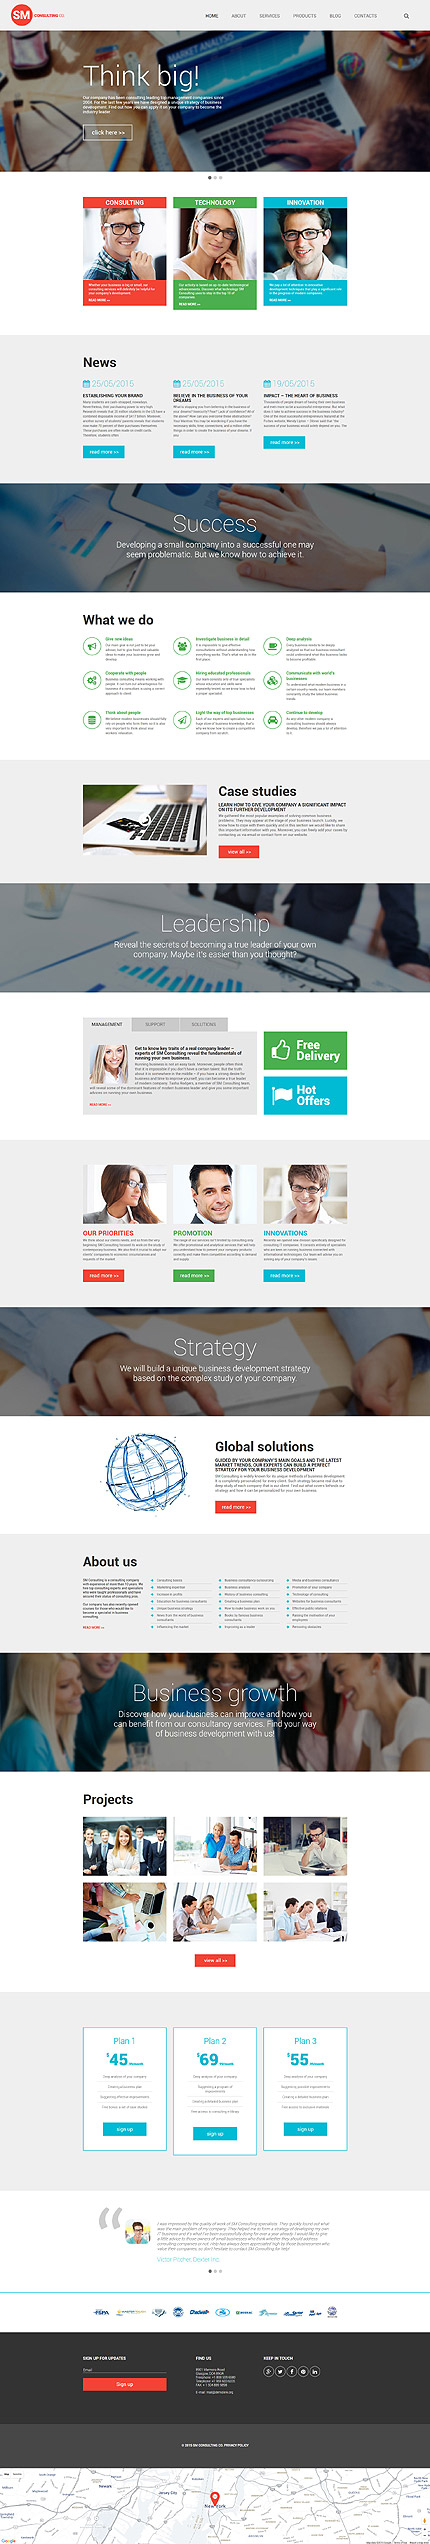 bedrijf wordpress template